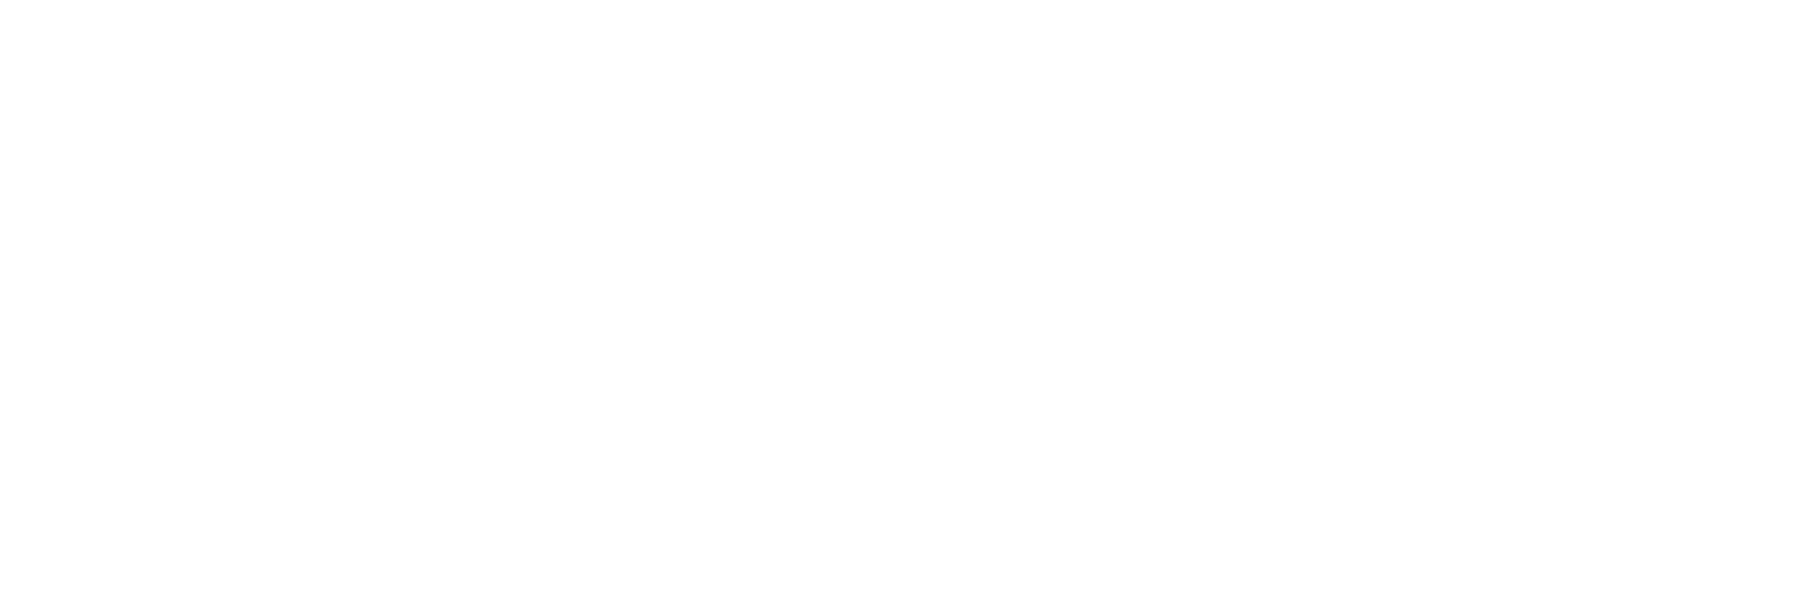 tendina 1